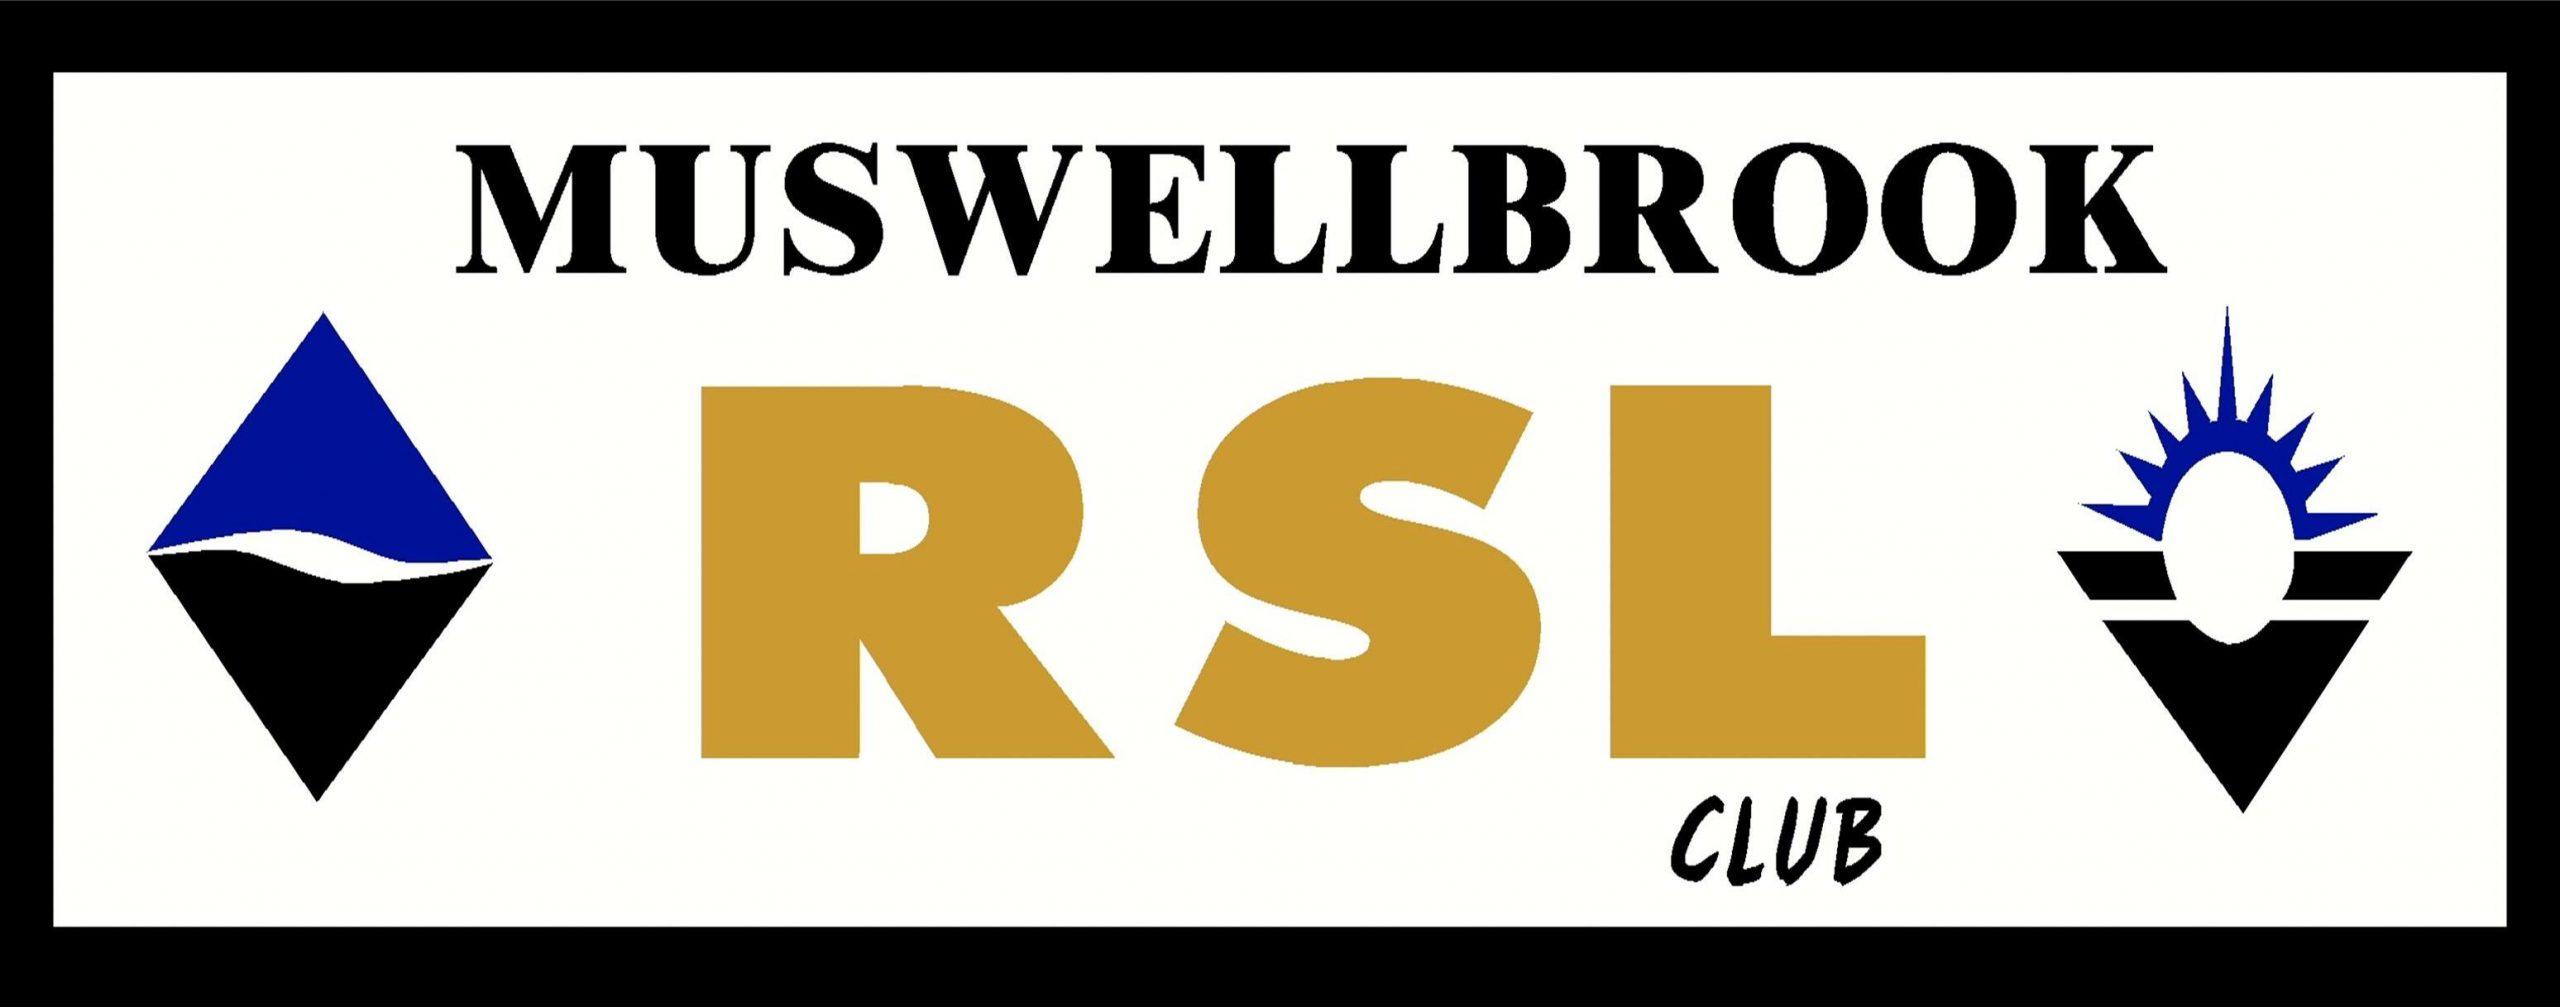 Muswellbrook RSL Club Logo